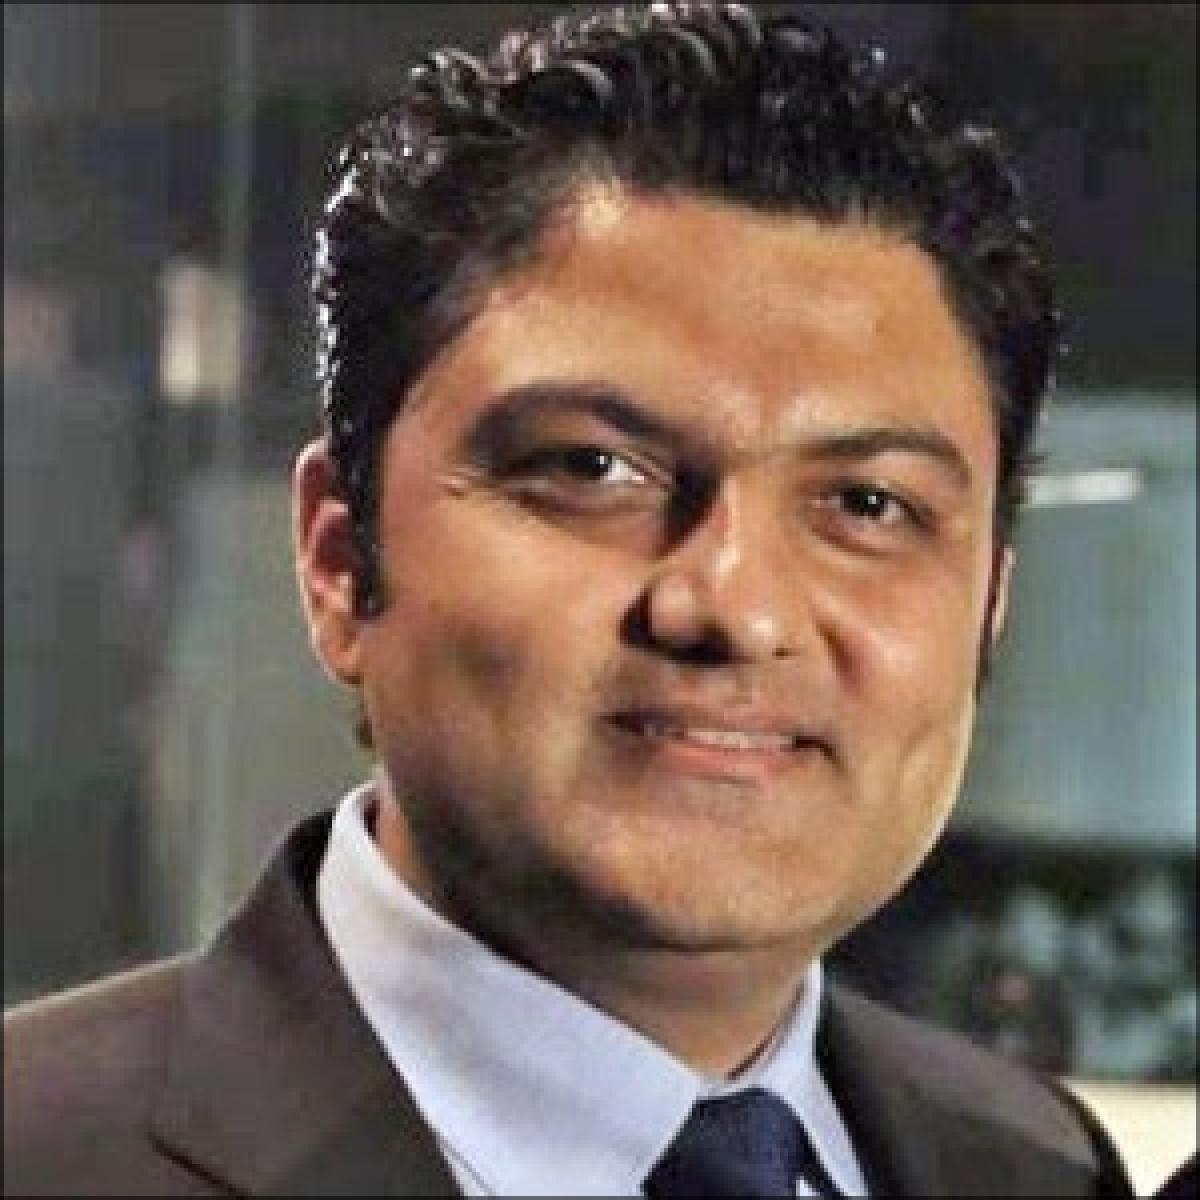 Abhesh Verma moves to Hindustan Times as CEO, Digital Streams